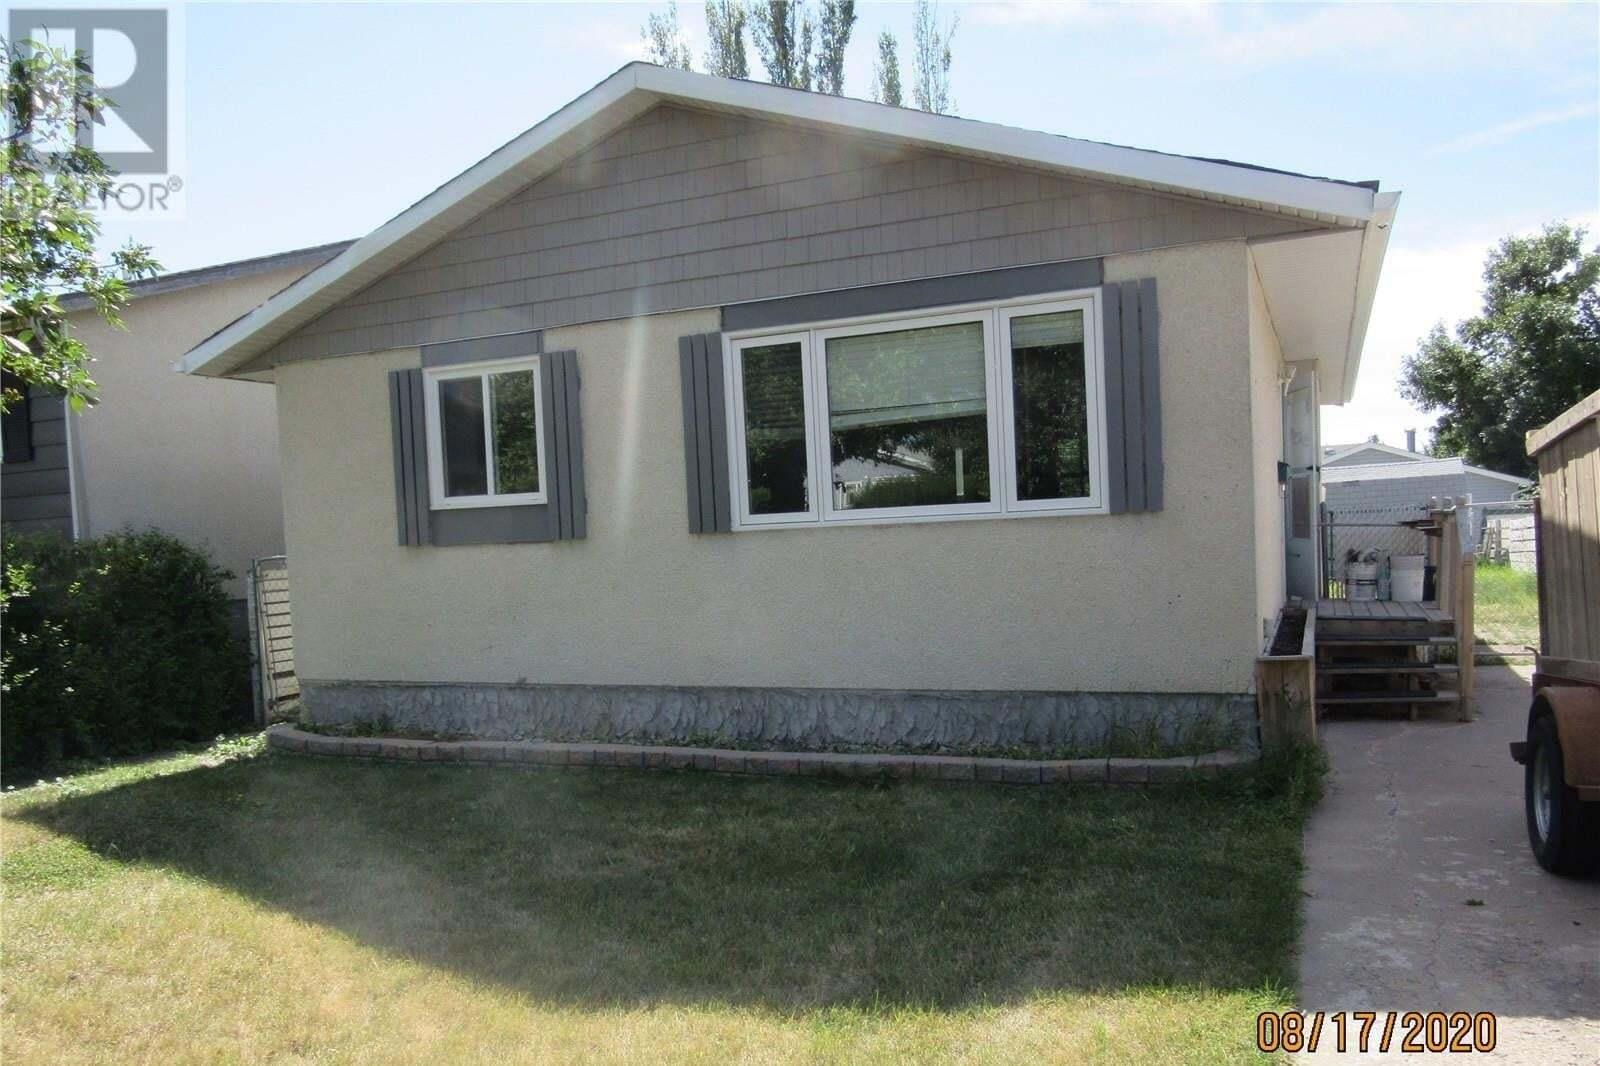 House for sale at 258 Waterloo Cres Saskatoon Saskatchewan - MLS: SK821076